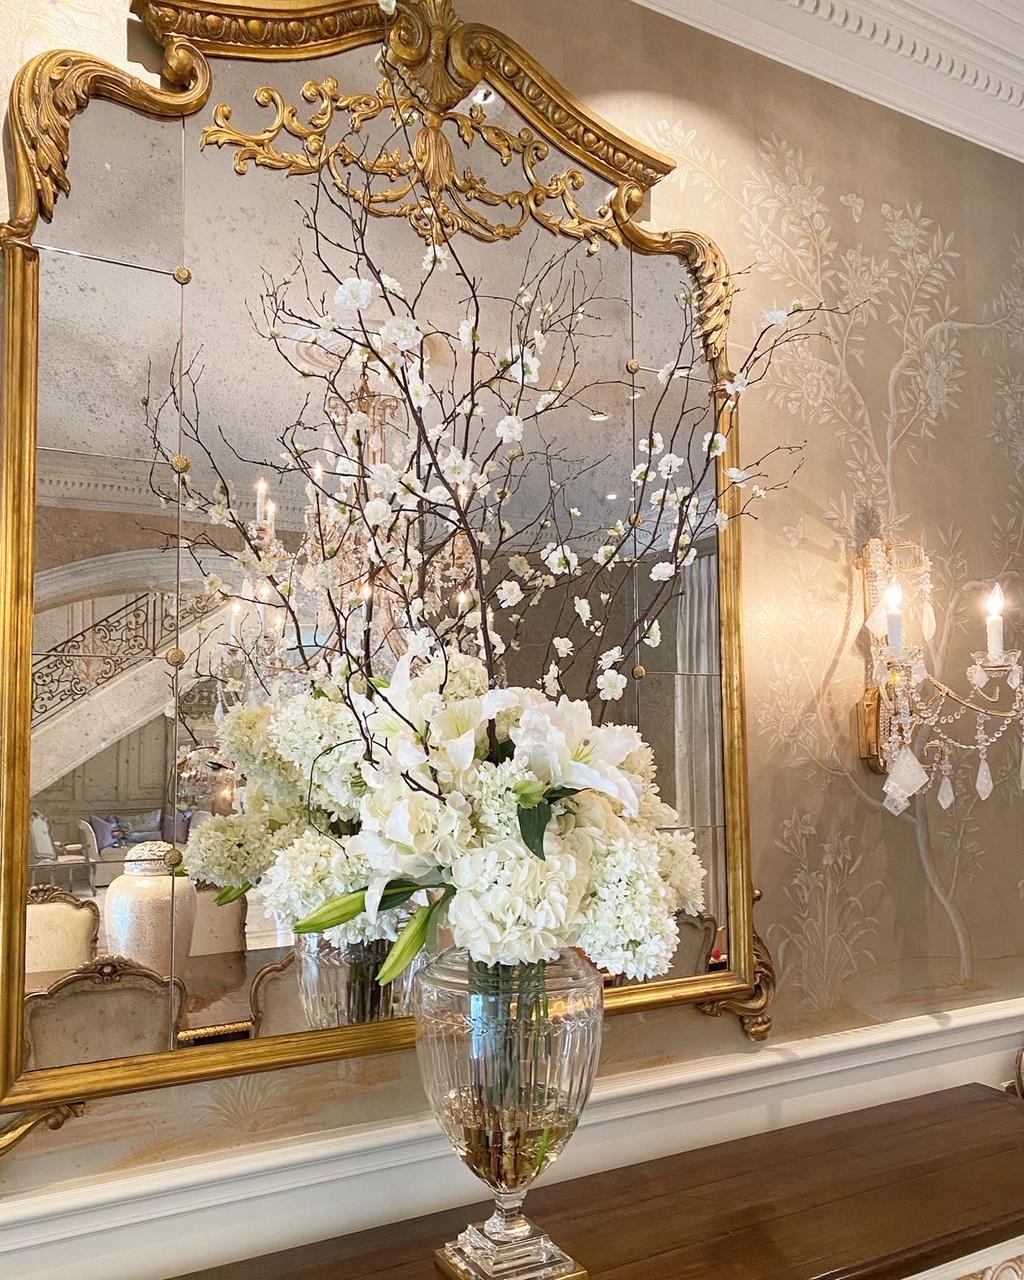 Hydrangea, Lilly, and branch arrangement